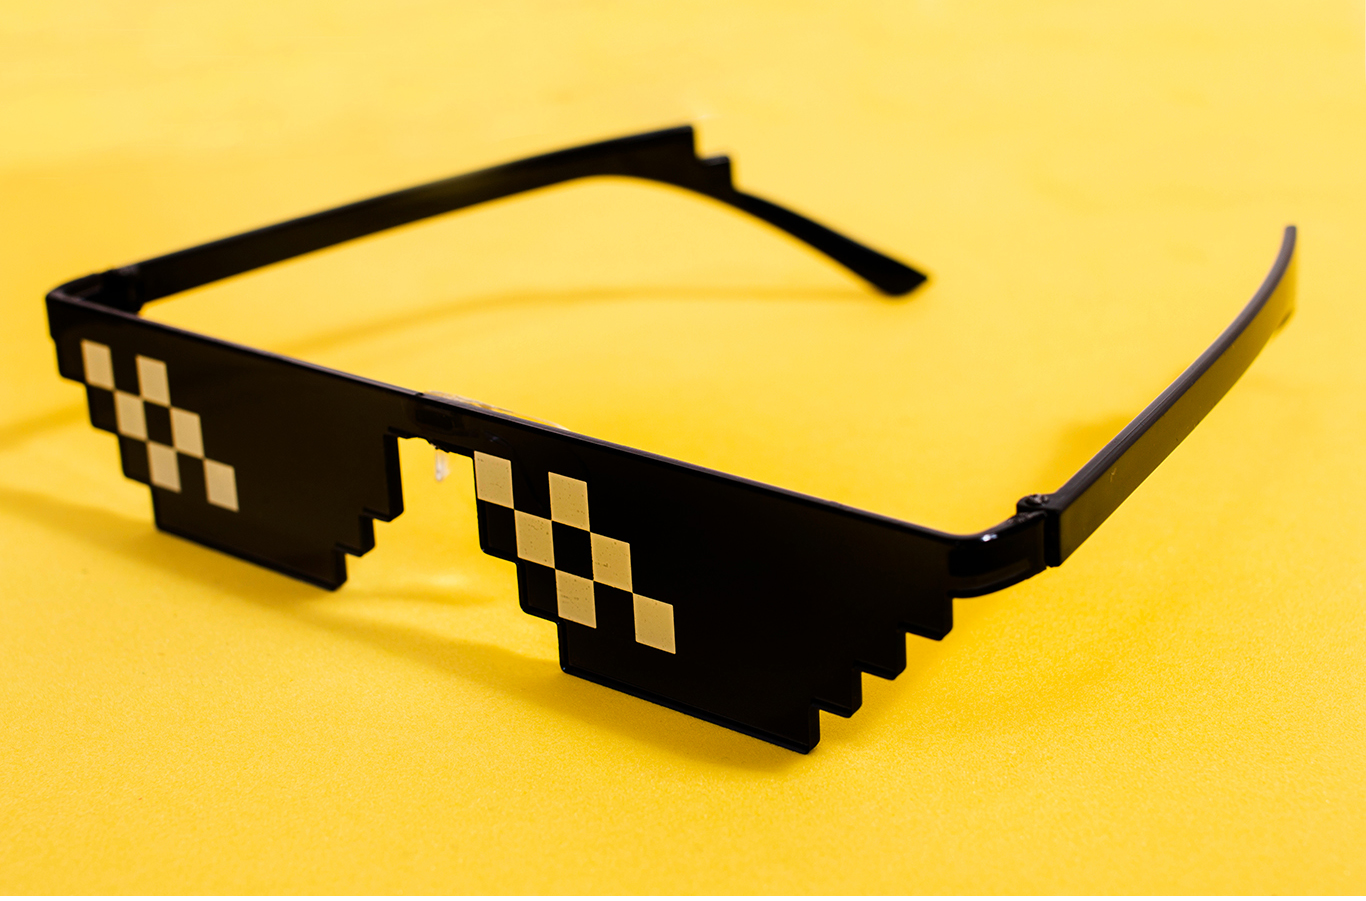 Digital Marketing memes. meme sunglasses with yellow background